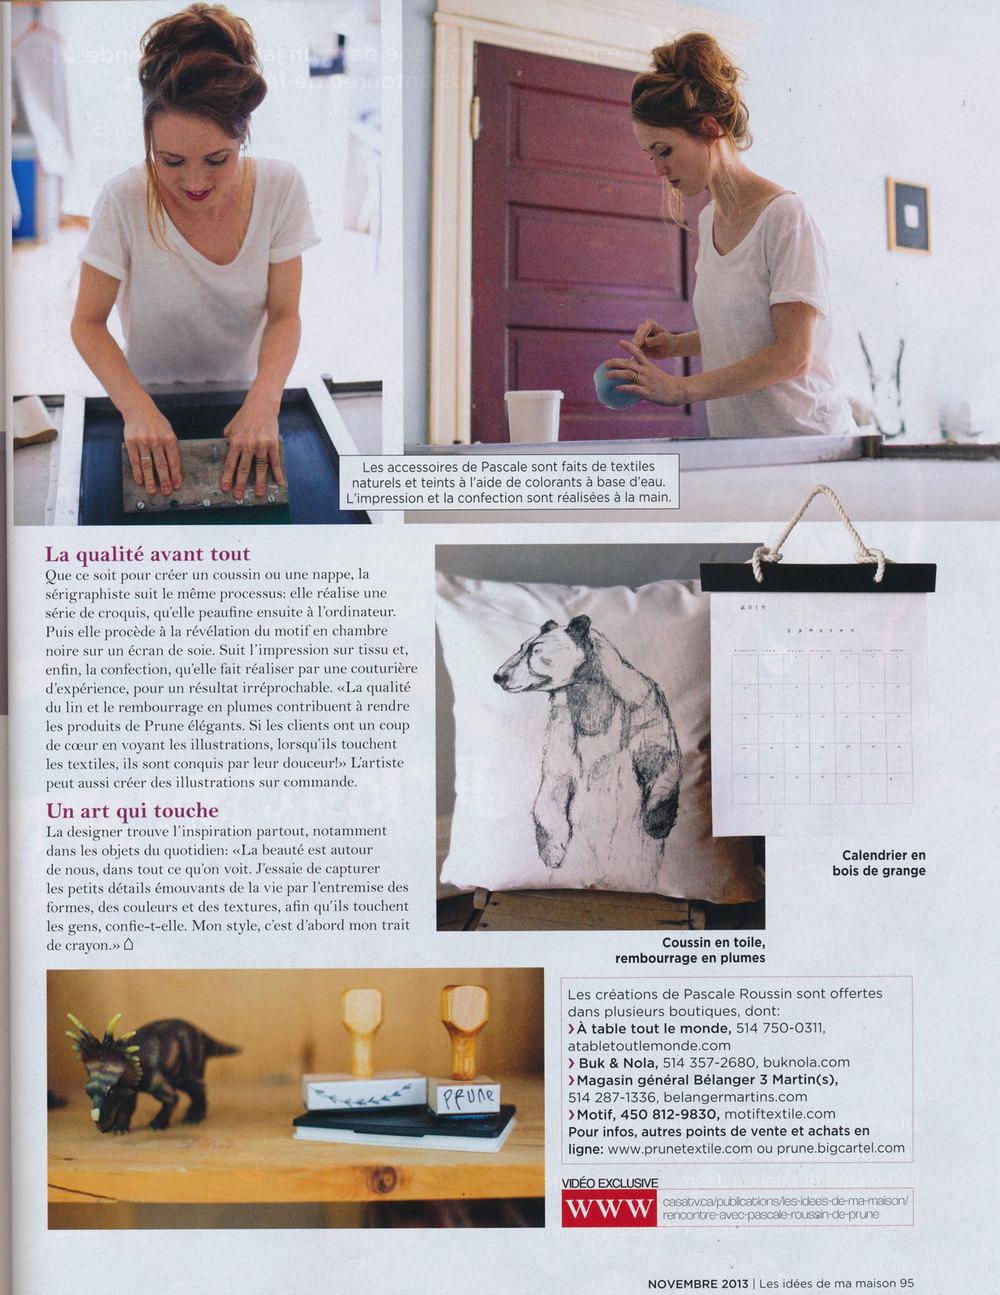 prune_textile_impression_Article_Idees_de_ma_maison_3.jpg